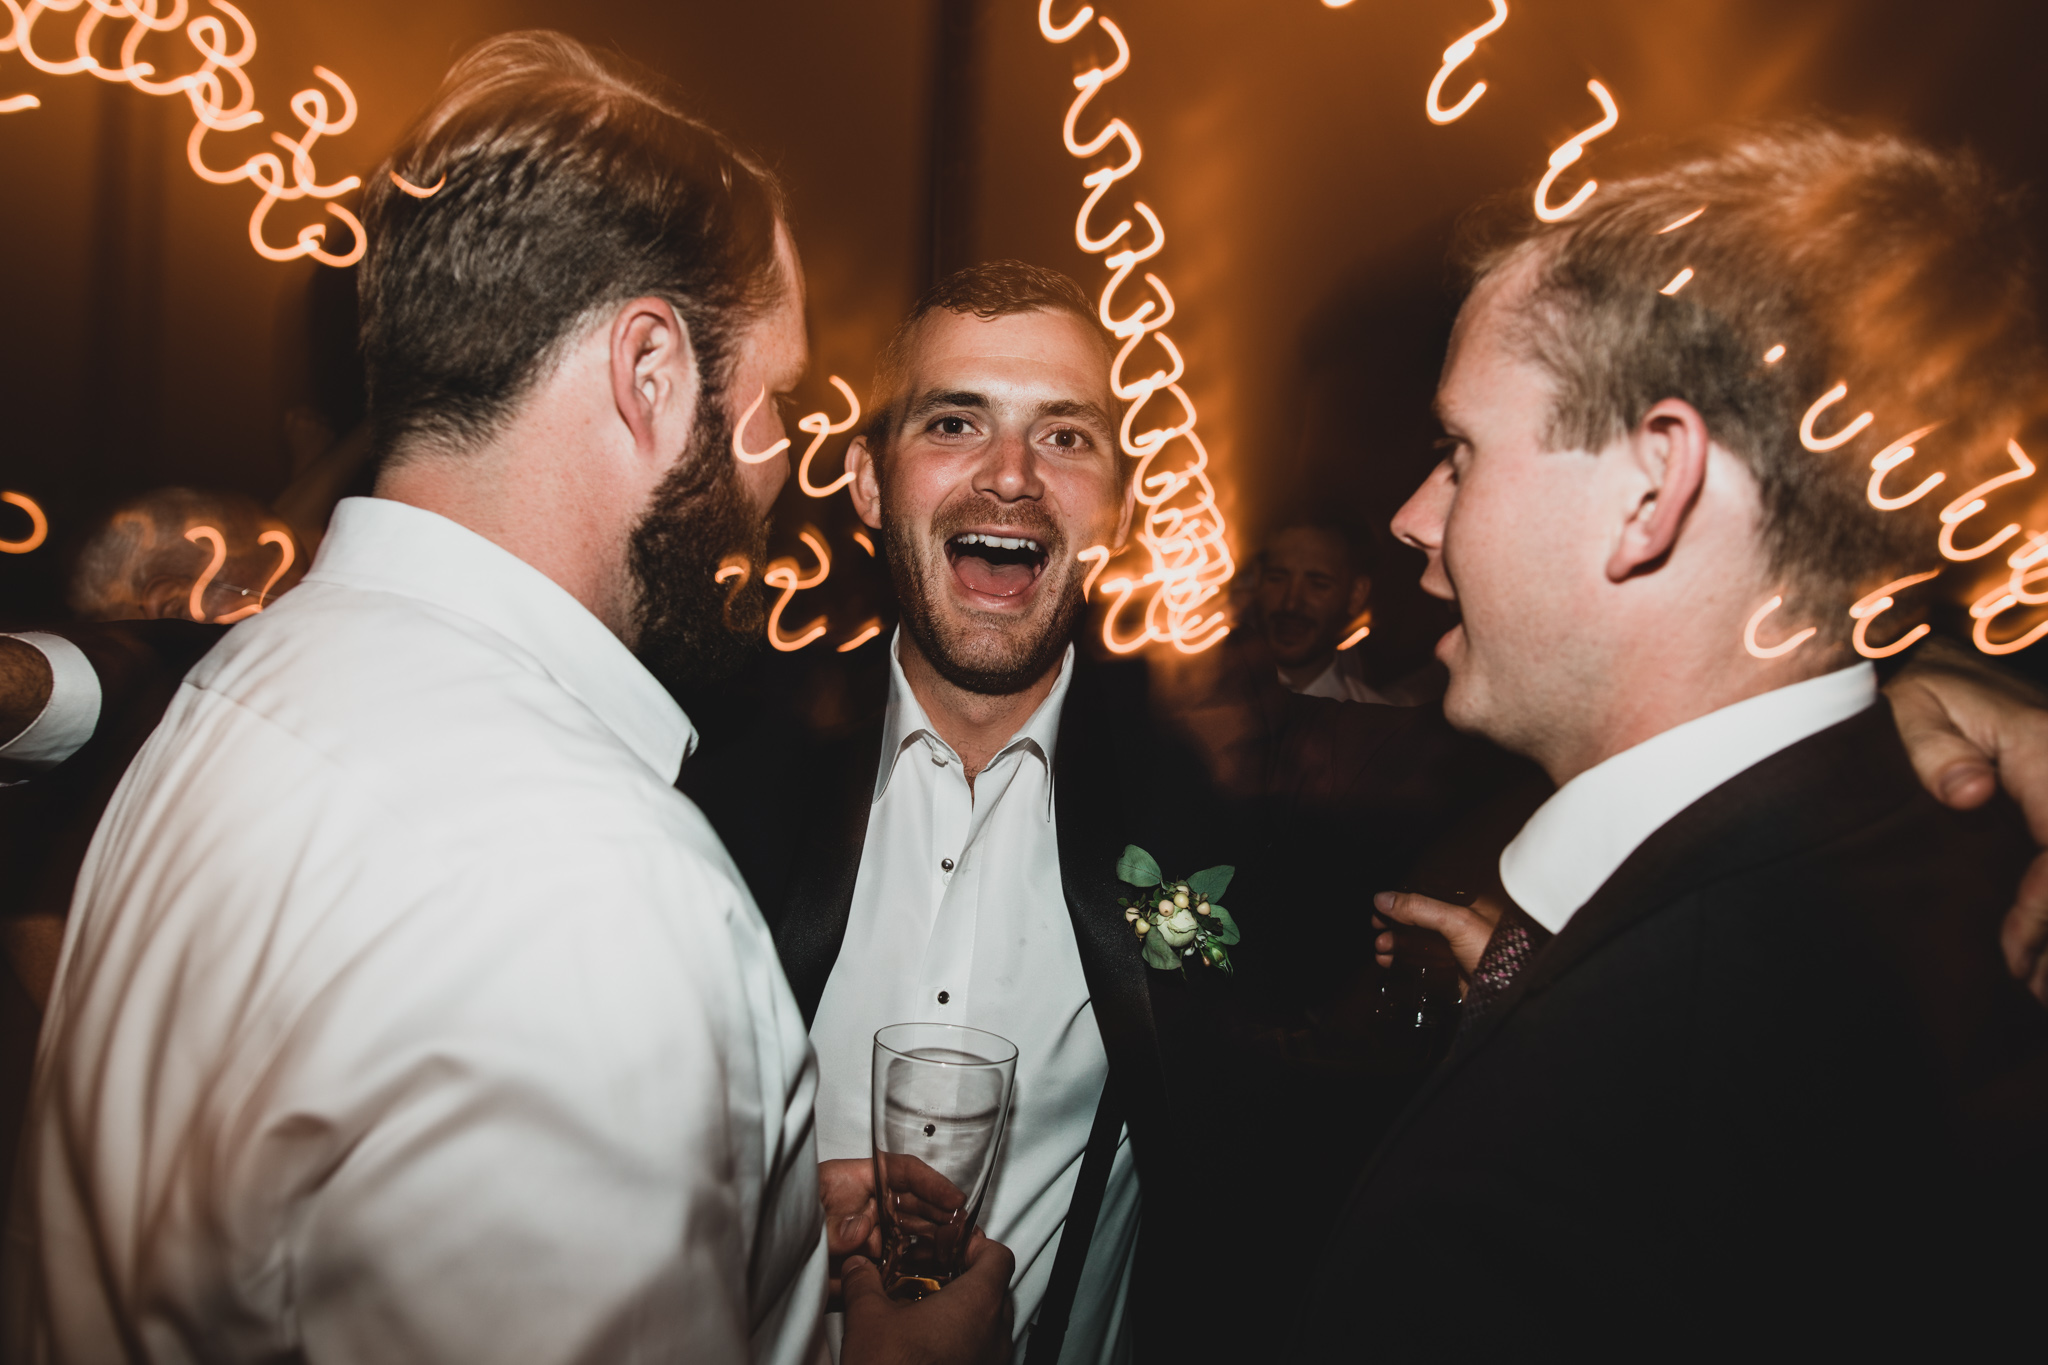 Artistic Wedding Imagery, Ottawa